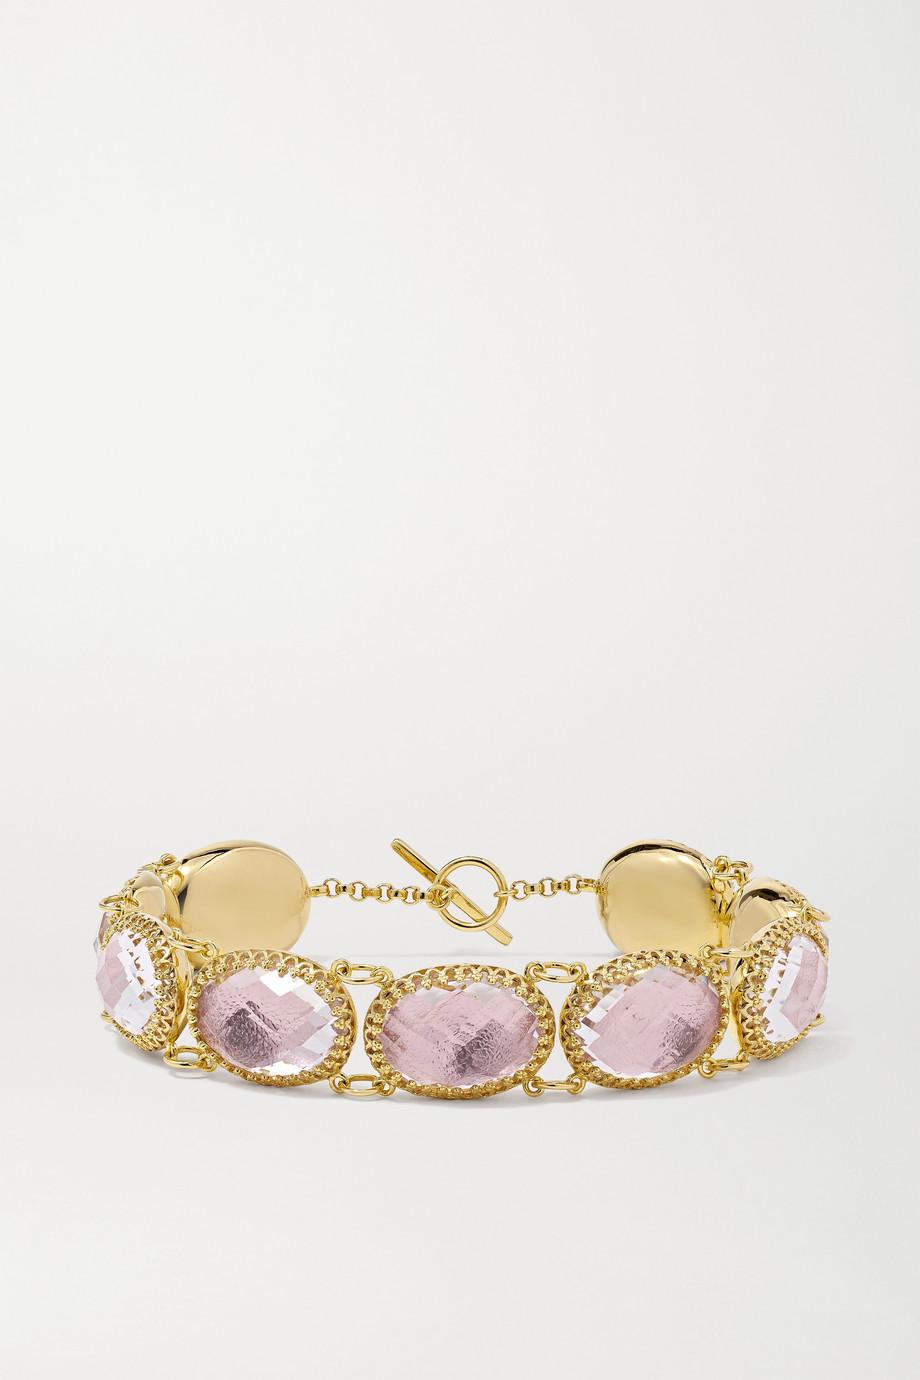 Larkspur & Hawk Lily 18-karat gold-dipped quartz bracelet